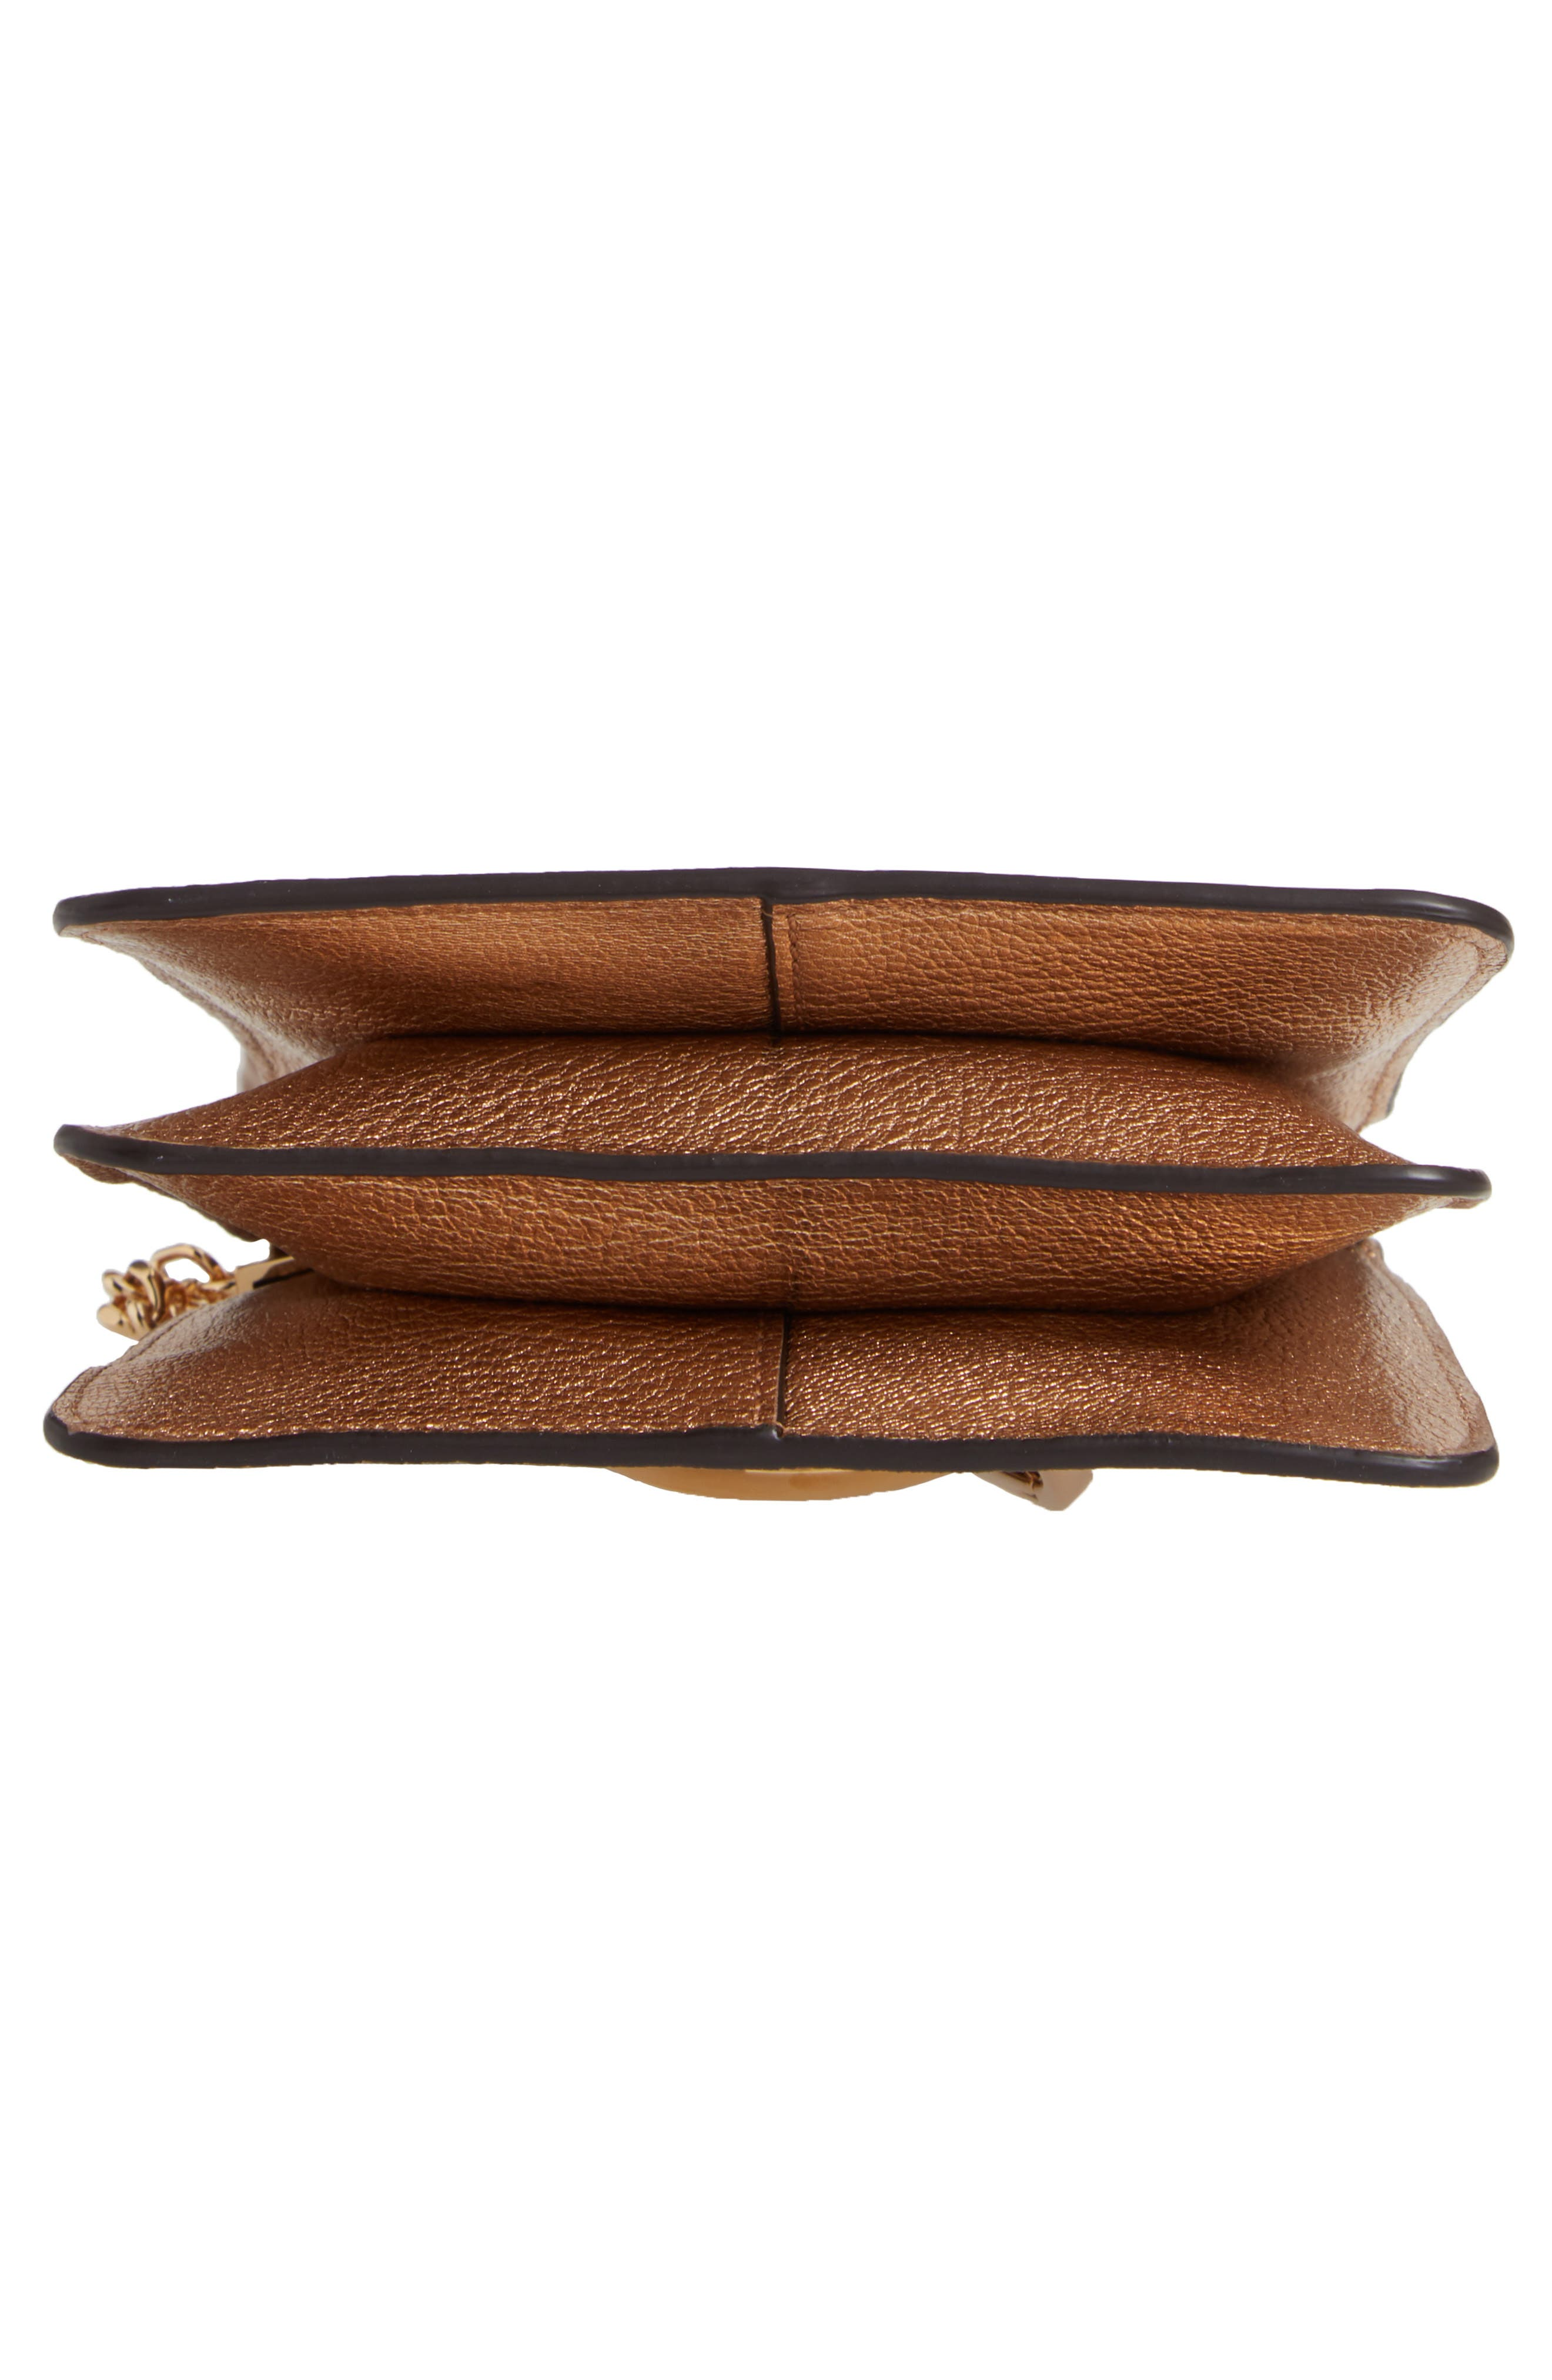 Faye Small Metallic Leather Bracelet Bag,                             Alternate thumbnail 7, color,                             GOLD